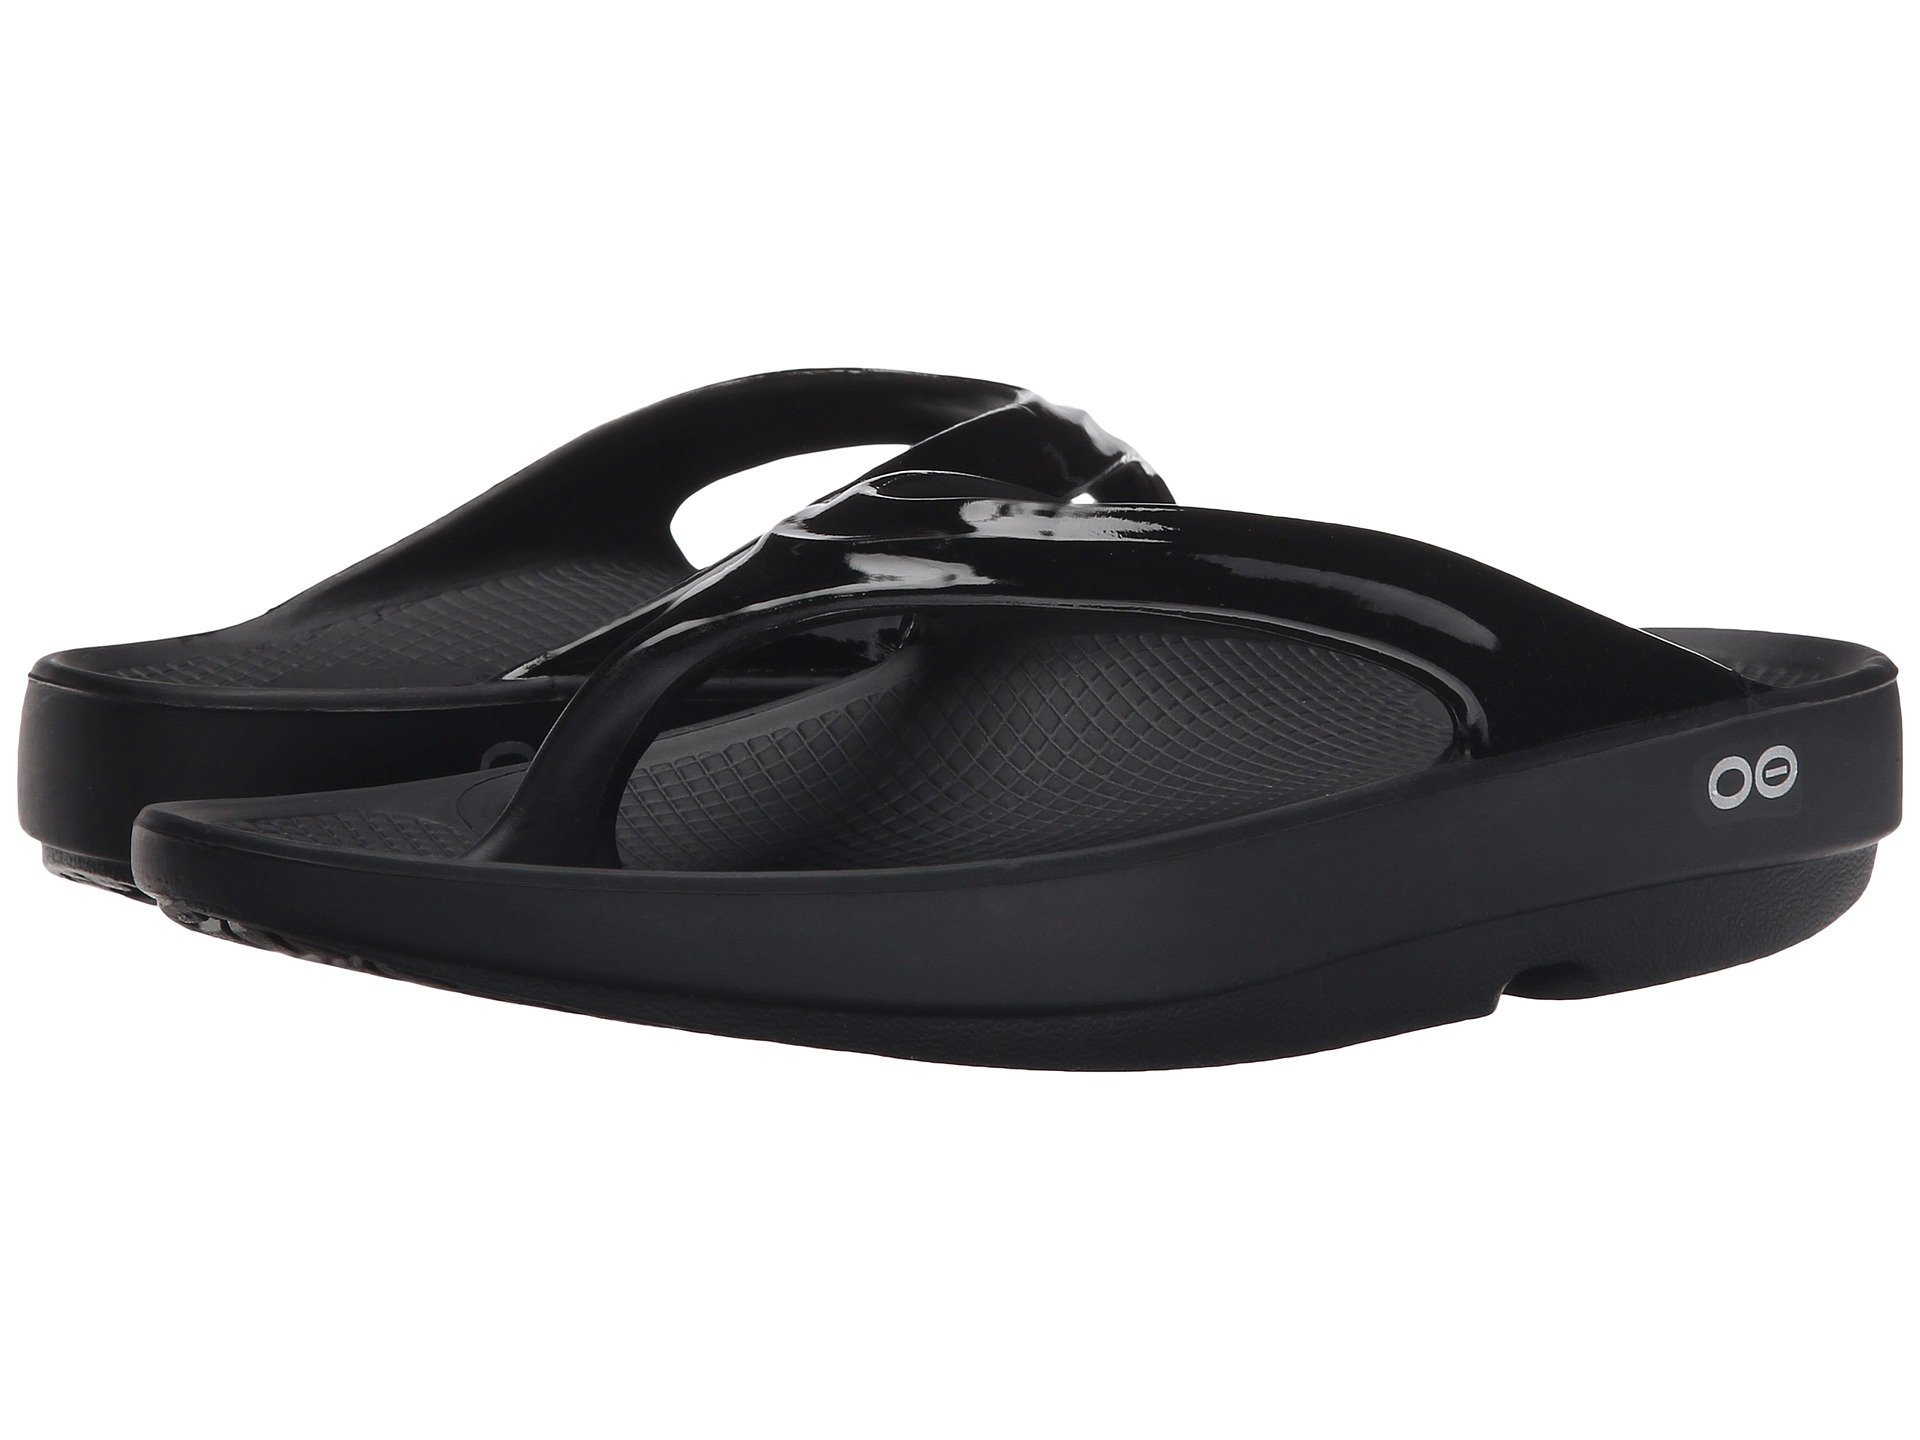 OOFOS Women's OOlala Sandal Black 9 M US